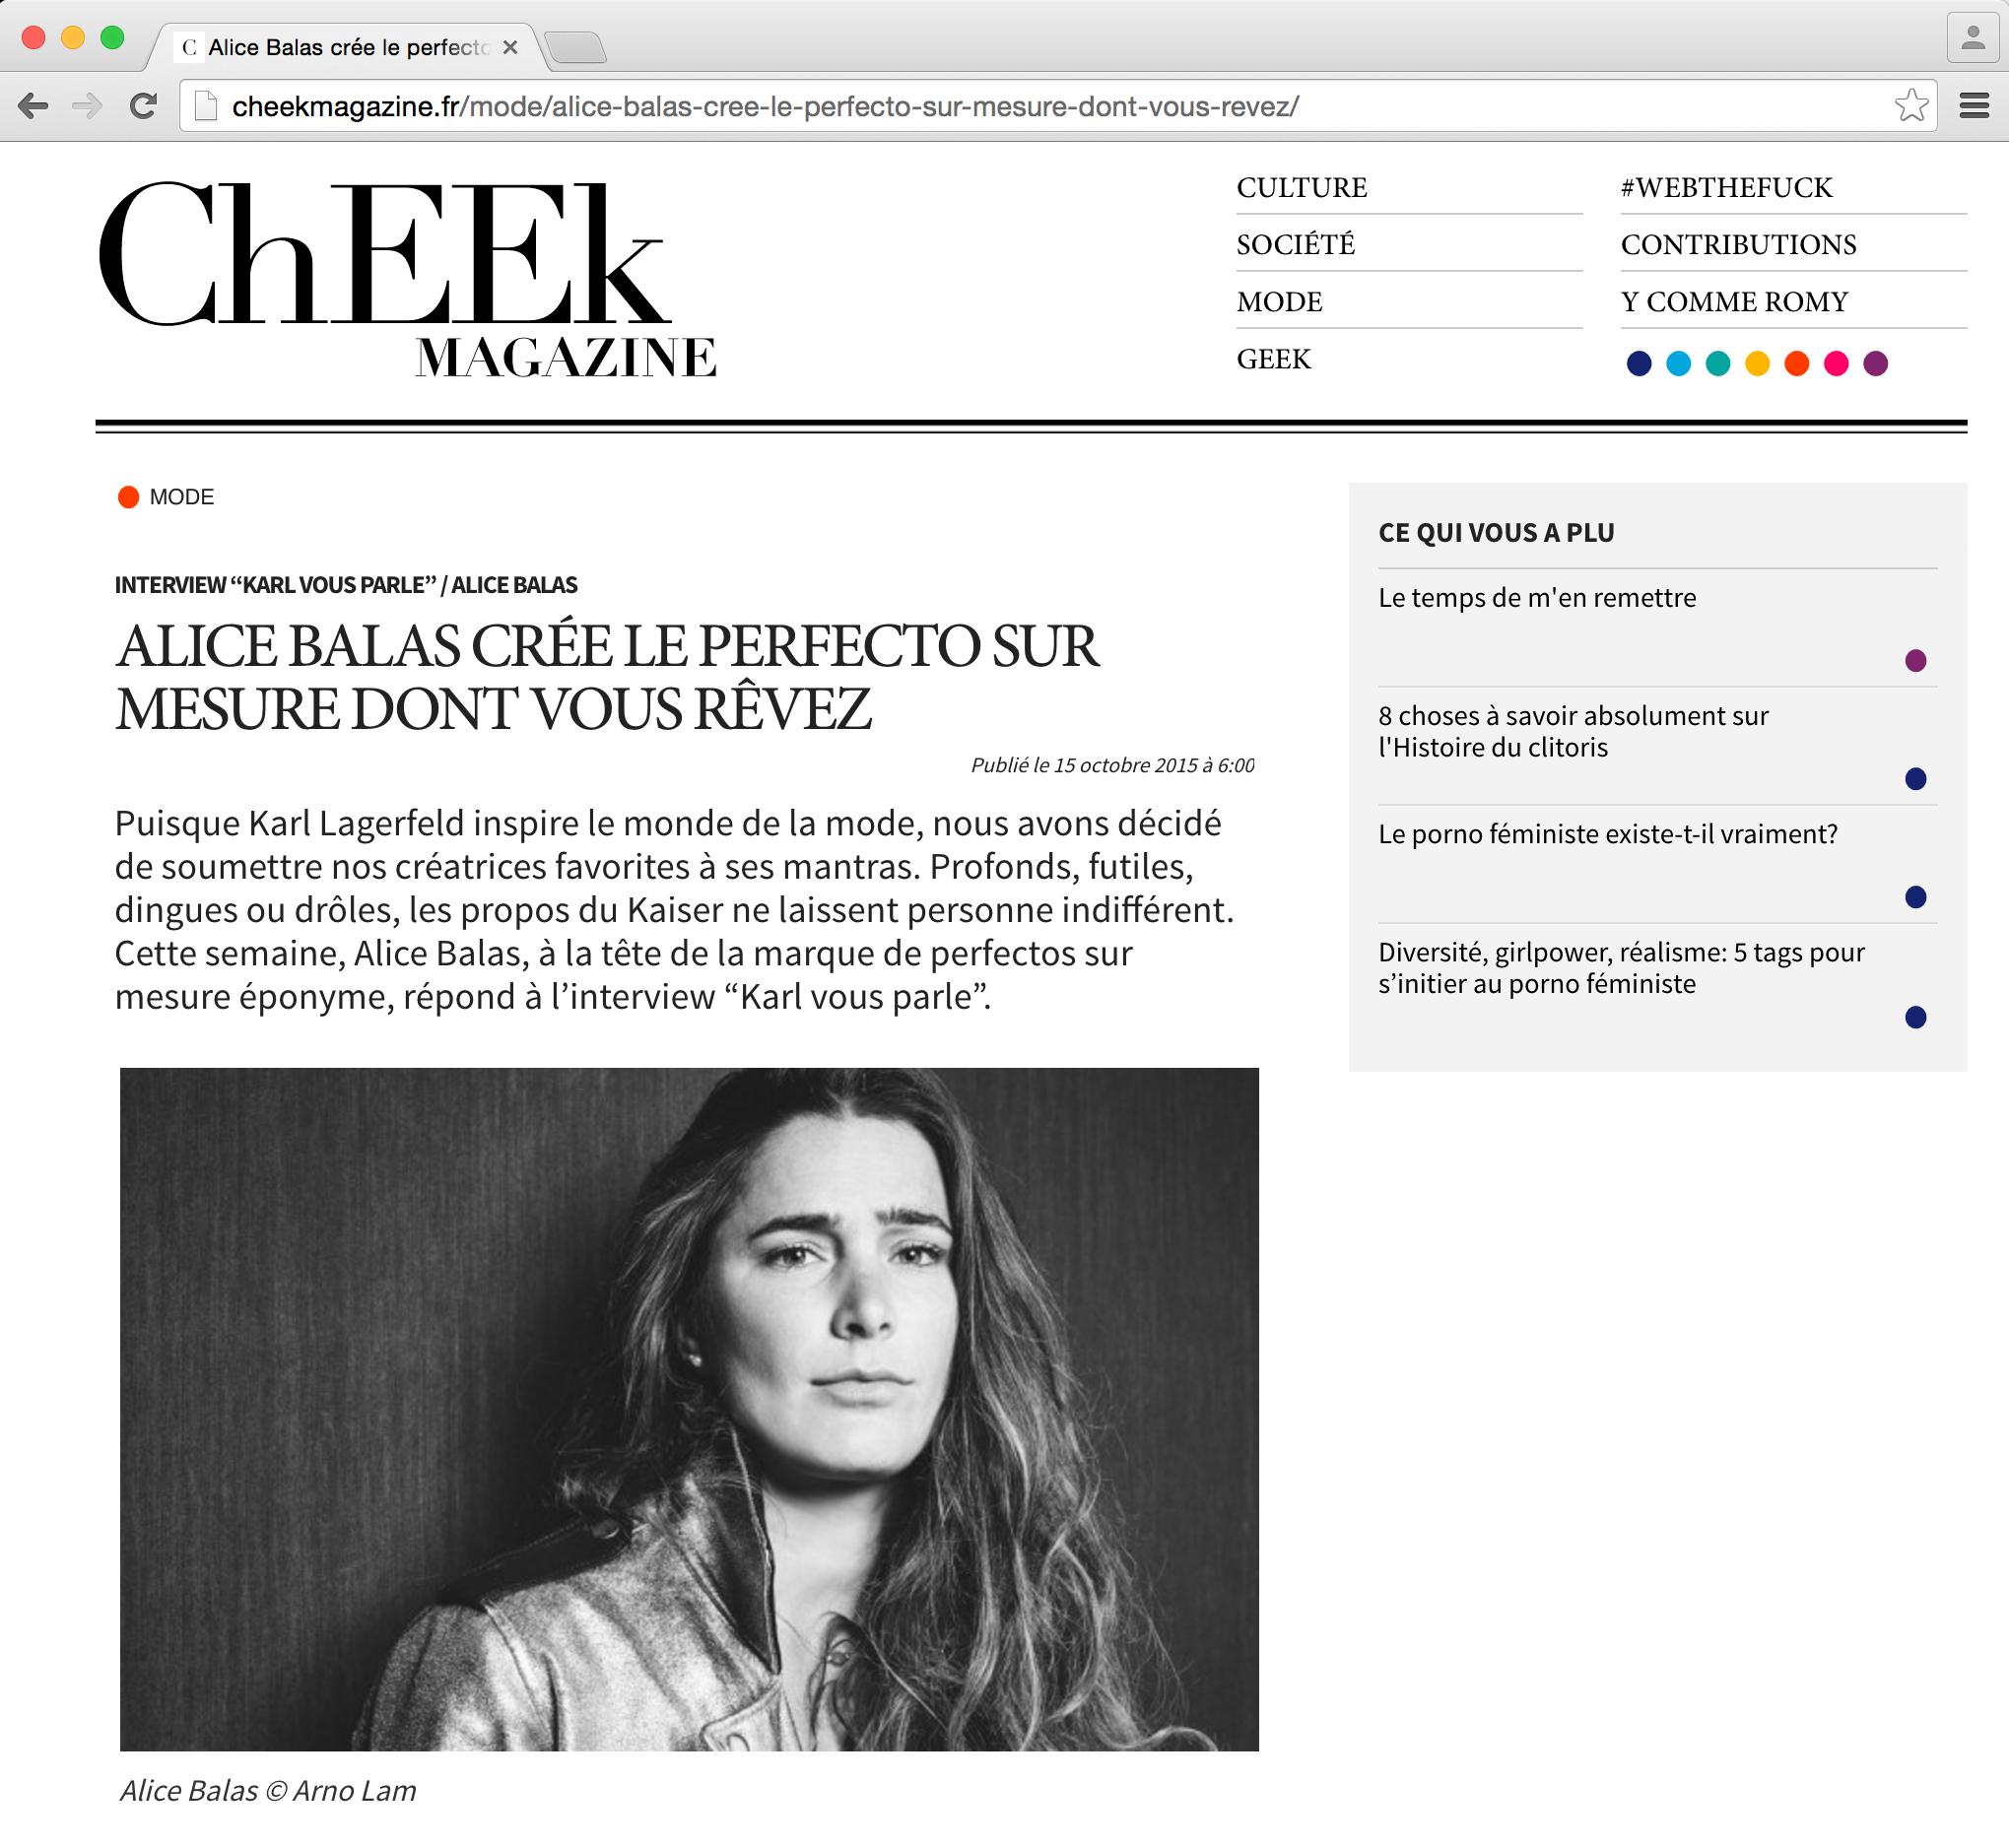 cheek-magazine-alicebalas.jpg